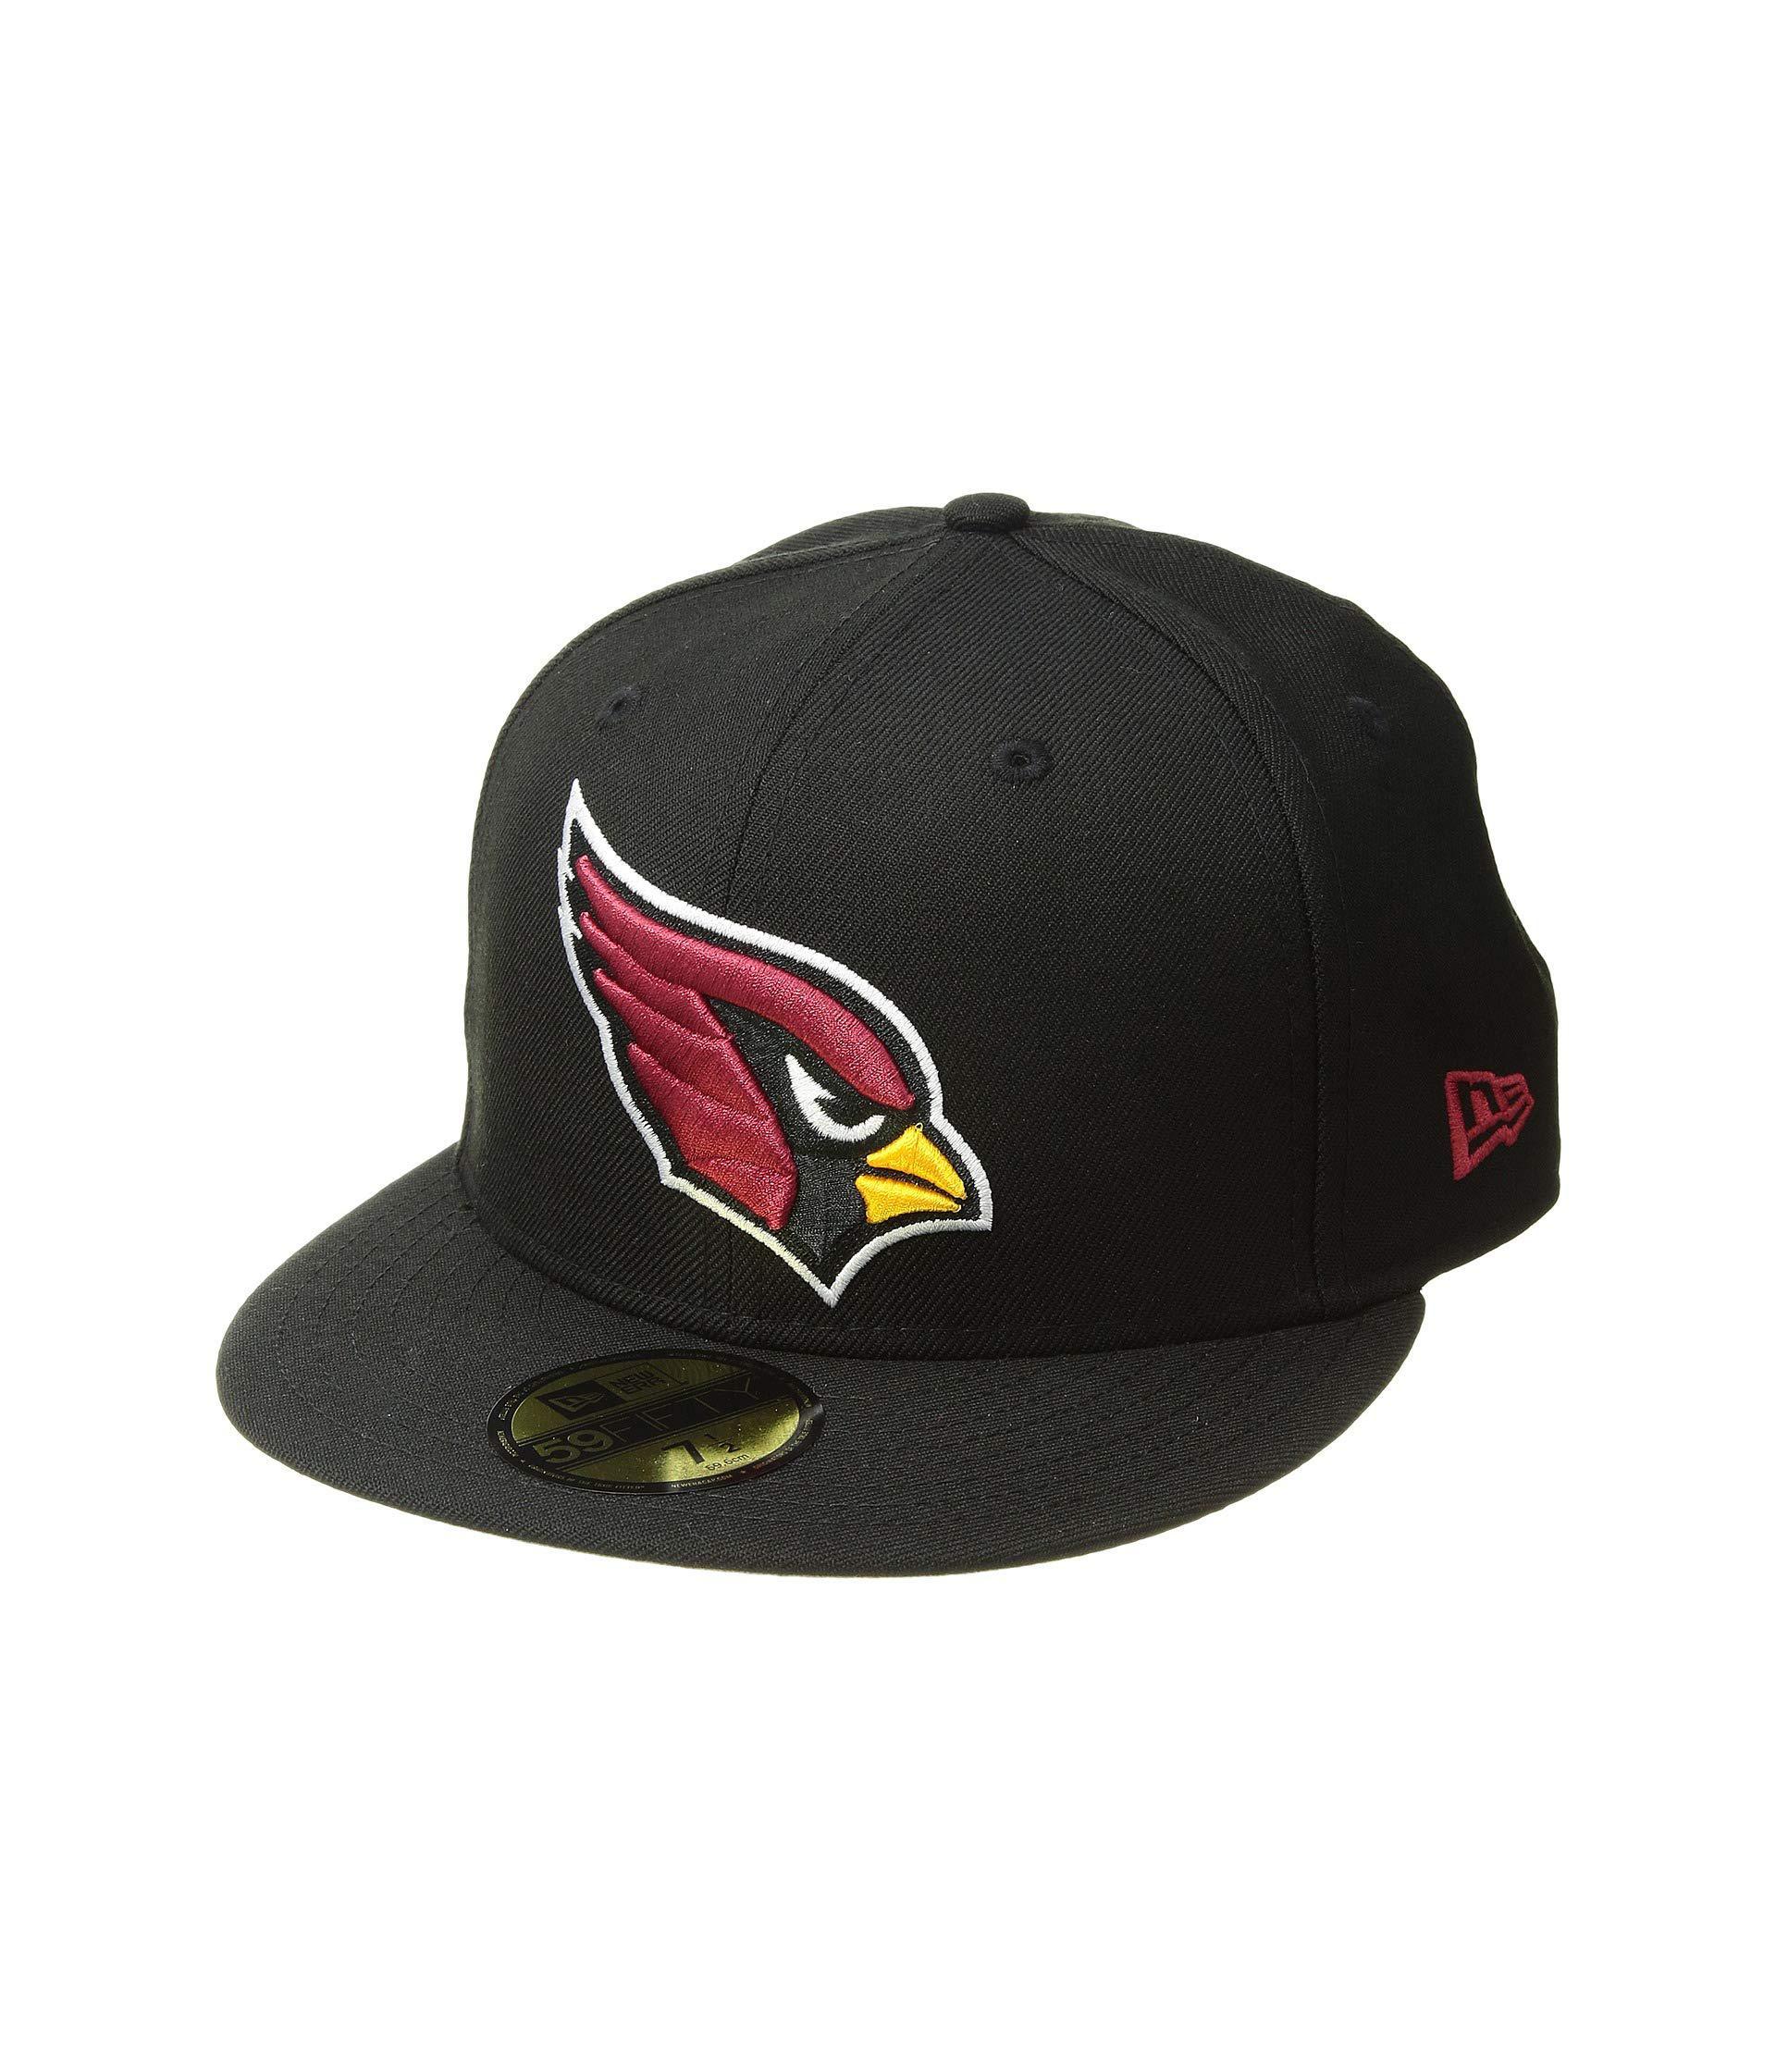 newest 925dd d6e5d KTZ - 59fifty Arizona Cardinals (black) Baseball Caps for Men - Lyst. View  fullscreen